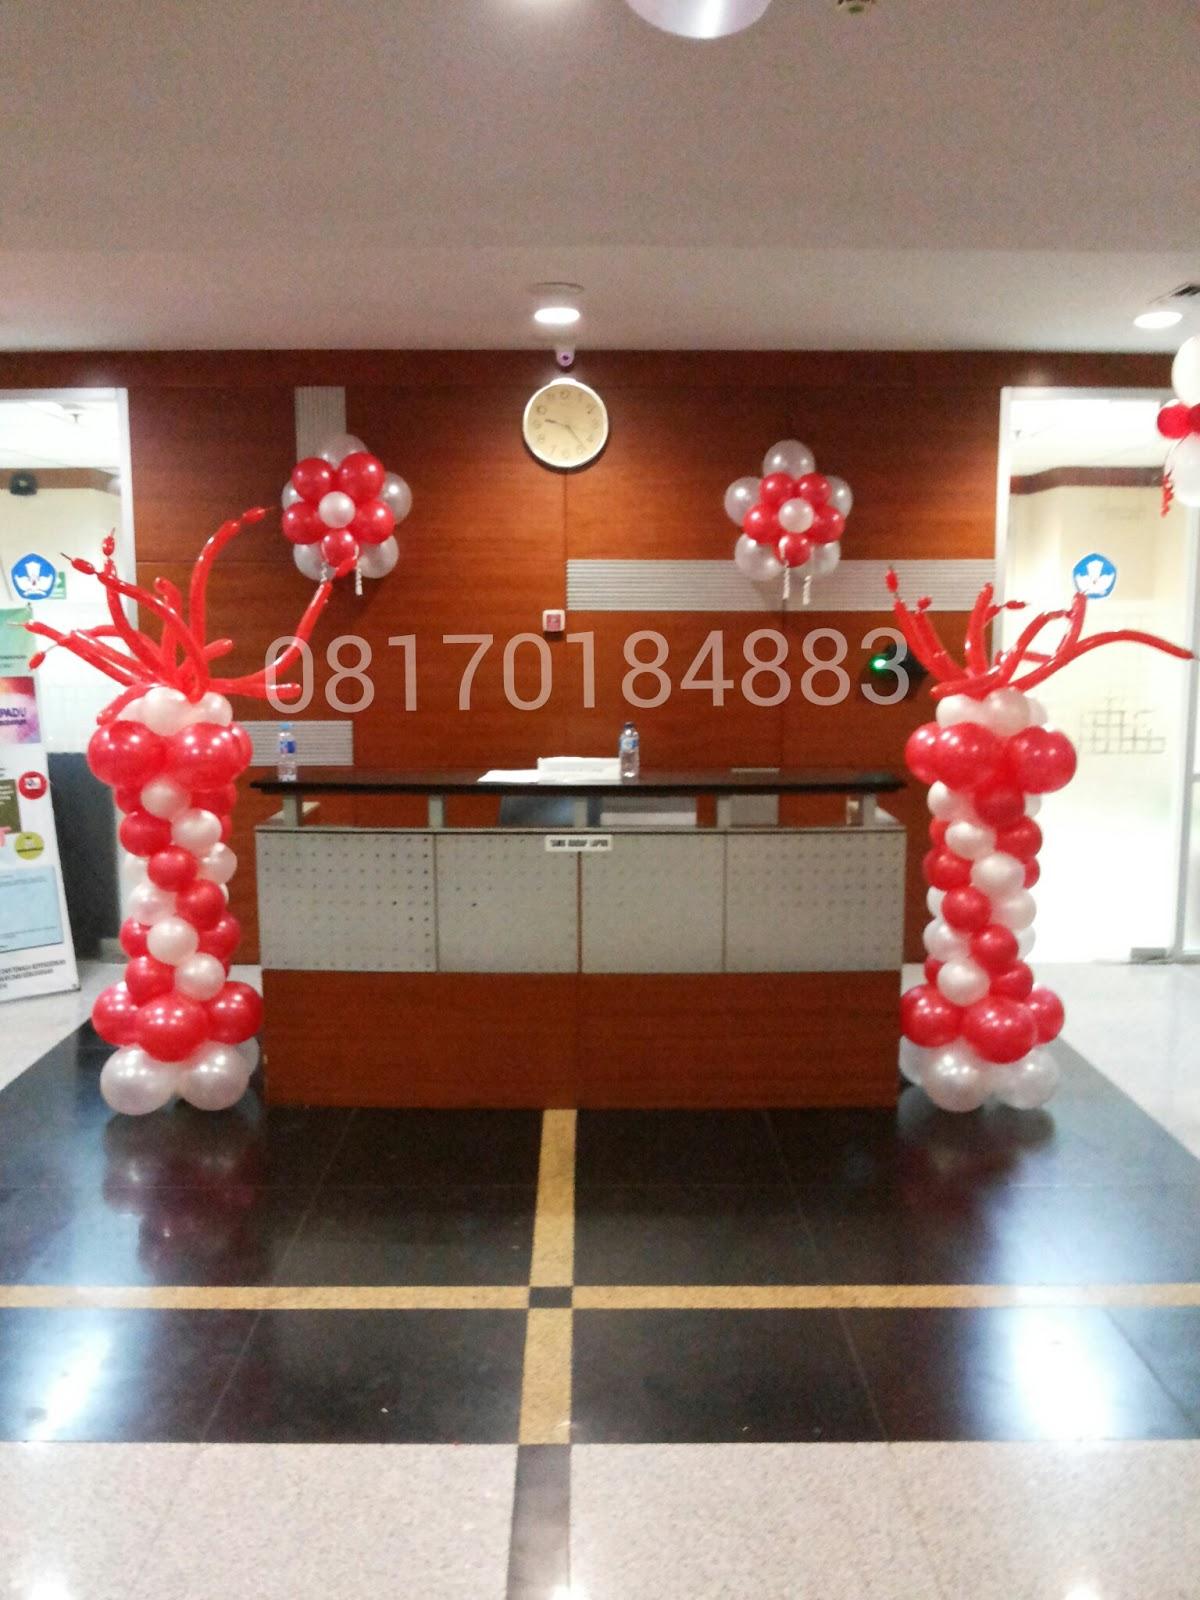 Balon dekorasi balon dekorasi ulang tahun for Dekor ulang tahun